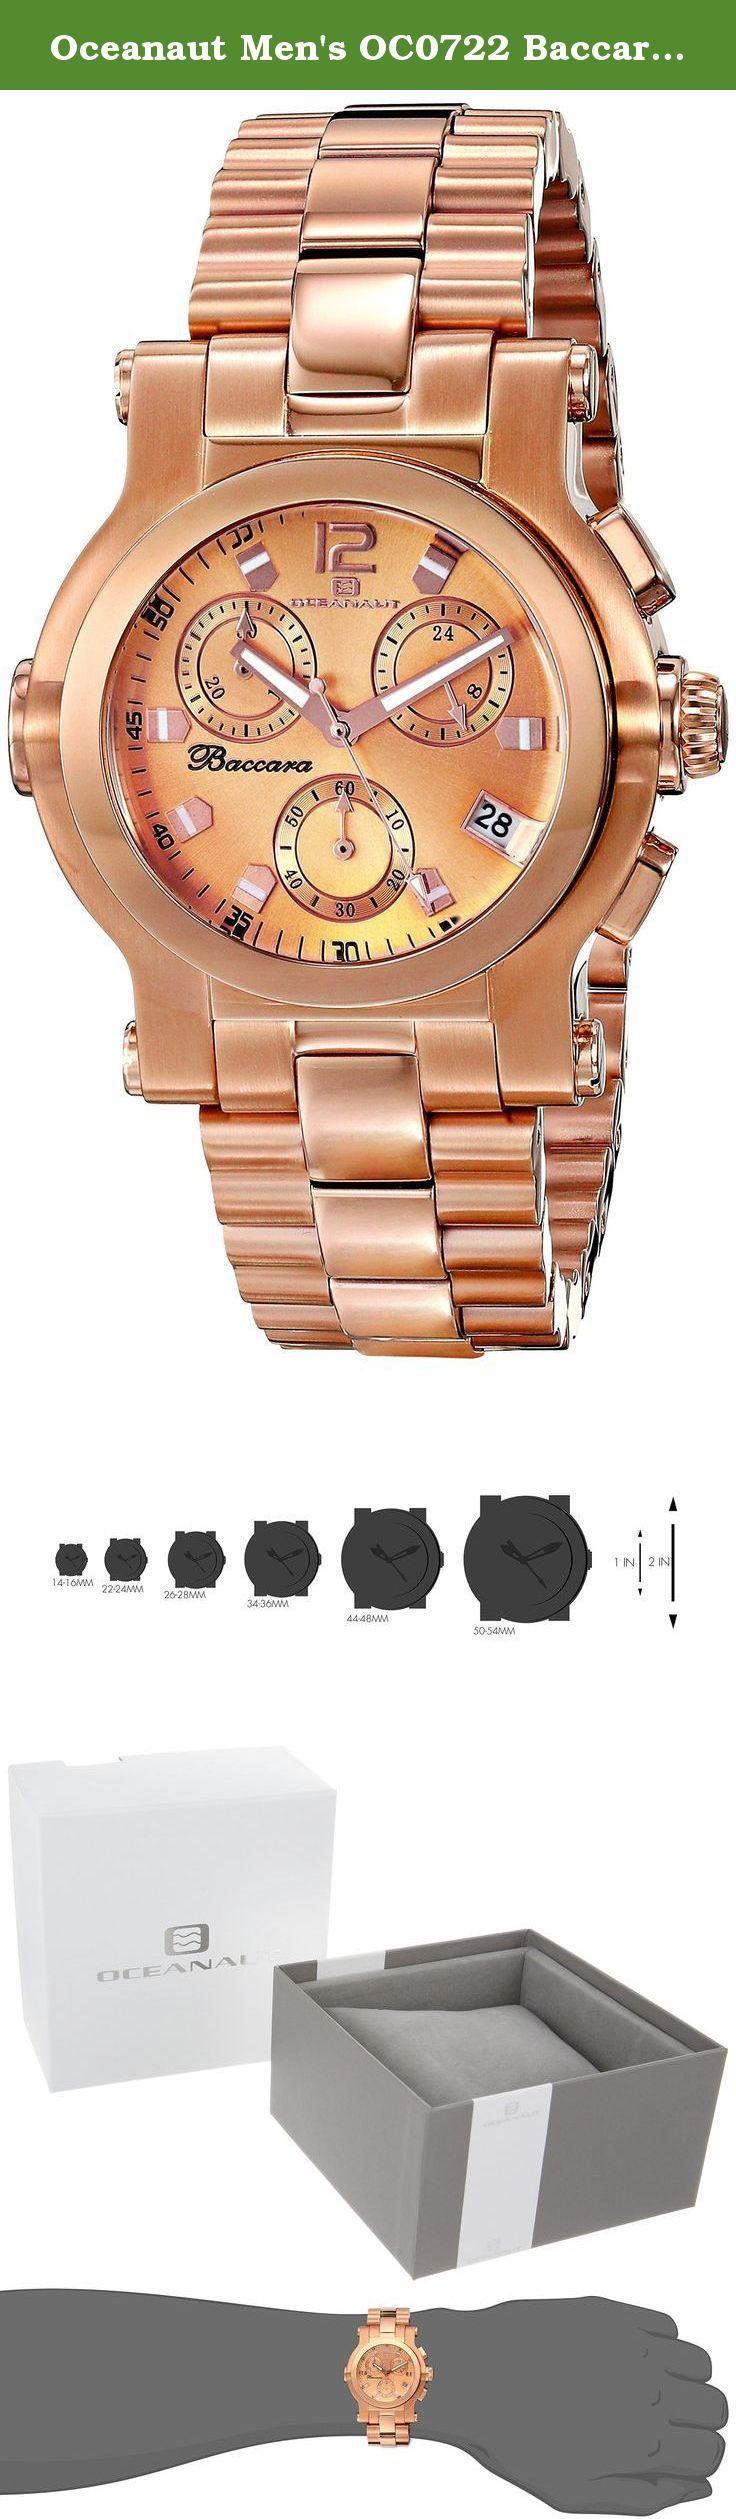 Oceanaut Men's OC0722 Baccara Analog Display Quartz Rose Gold Watch. Oceanaut Men's Baccara Stainless steel case, Stainless steel bracelet, Rose Gold dial, Quartz movement, Scratch resistant mineral, Water resistant up to 5 ATM - 50 meters - 165 feet.